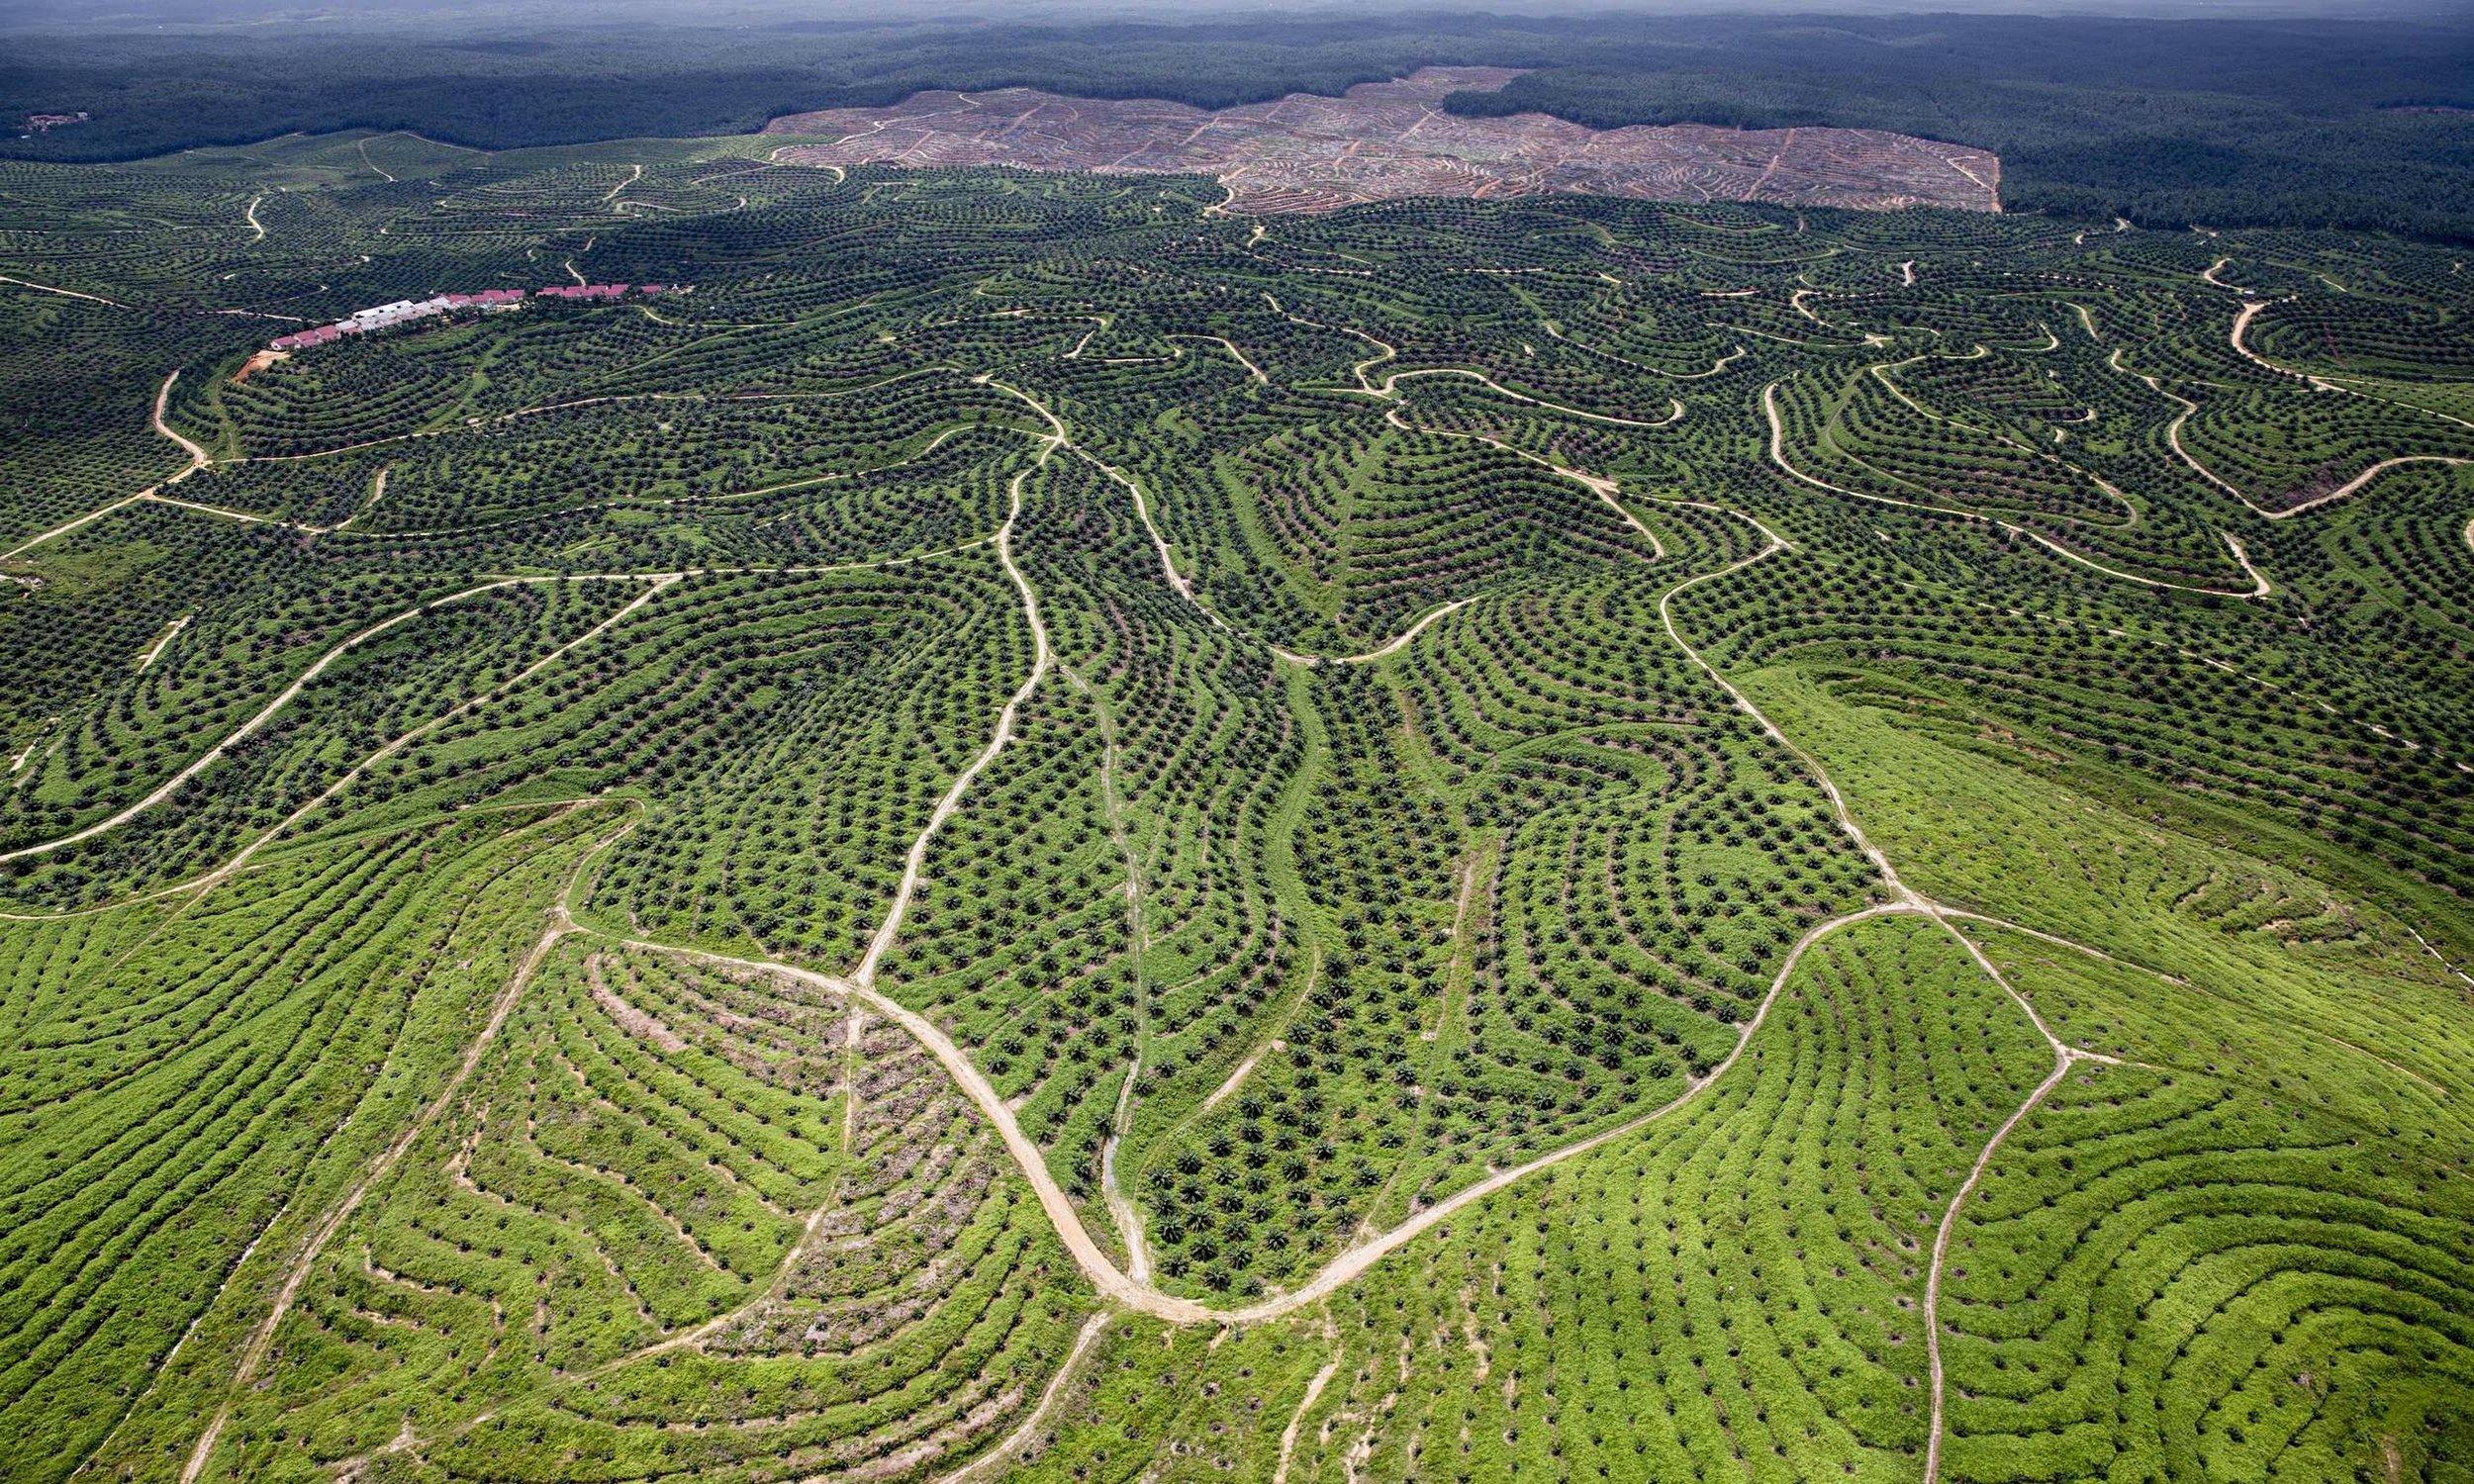 A-Wilmar-palm-oil-plantat-014-guardian.jpg